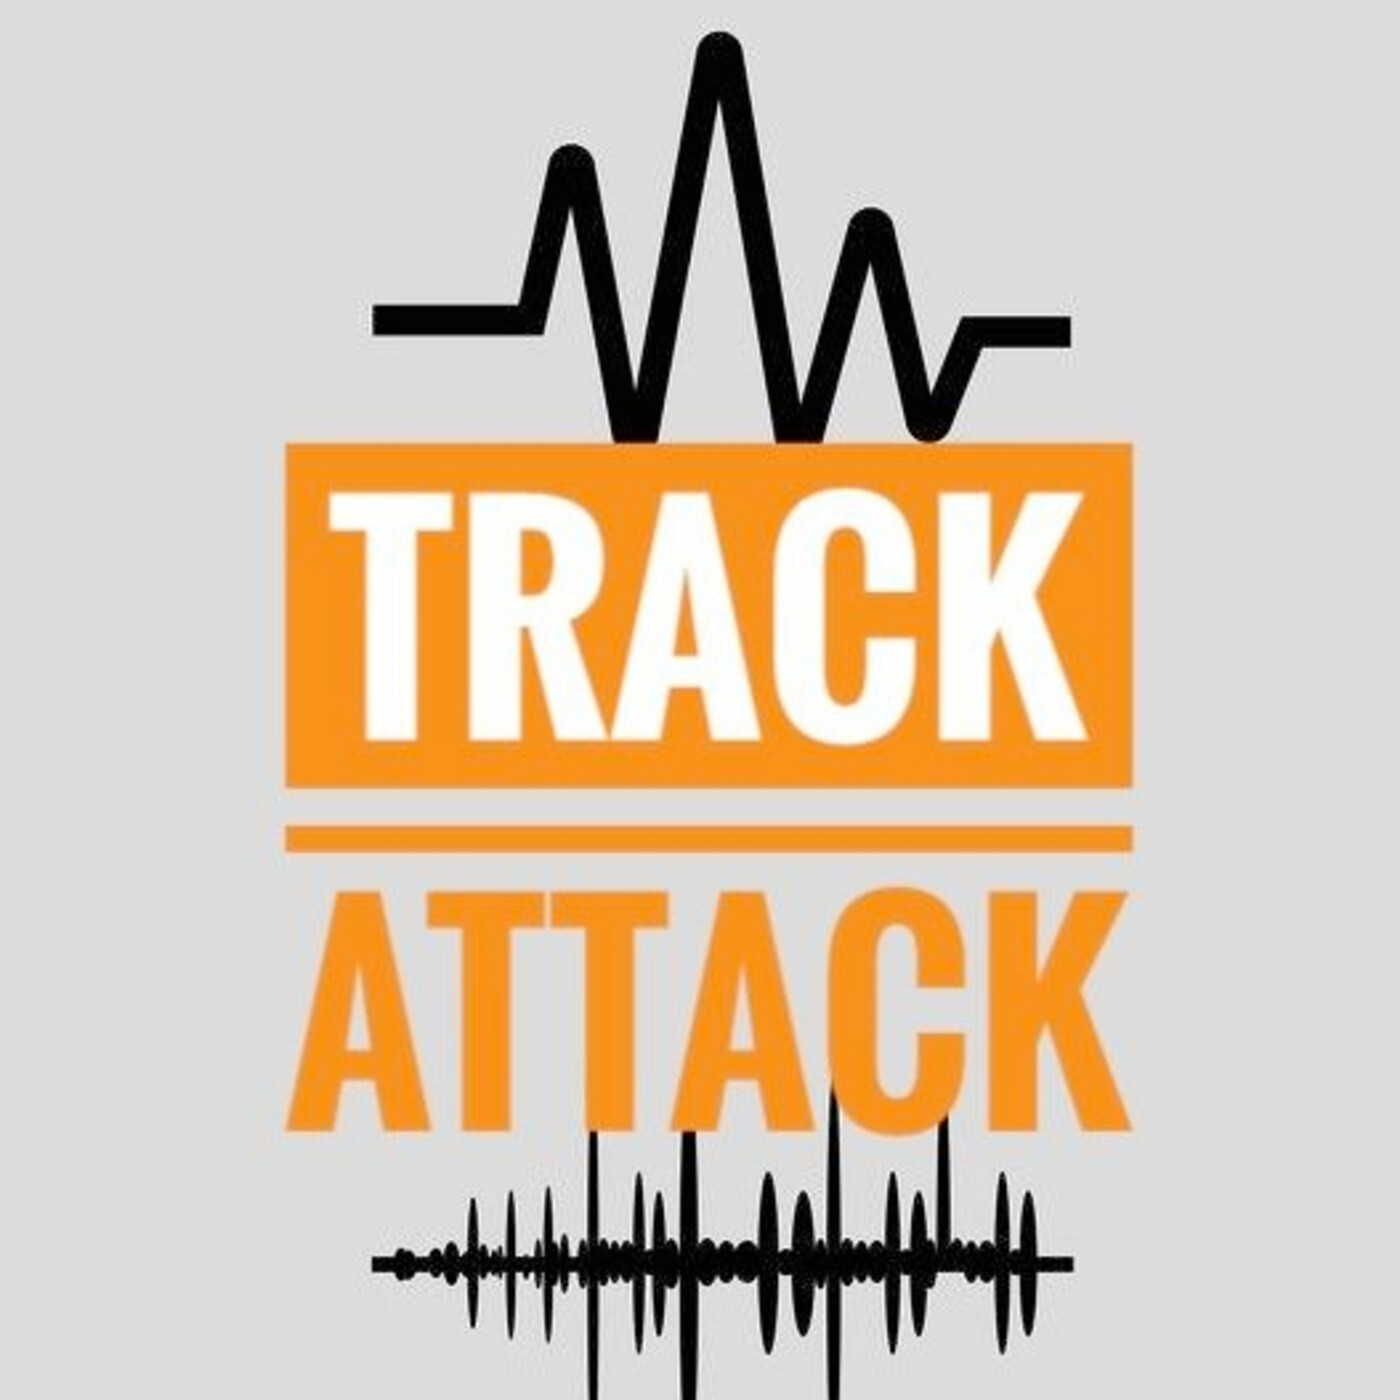 Track Attack 14 de Junio 2020